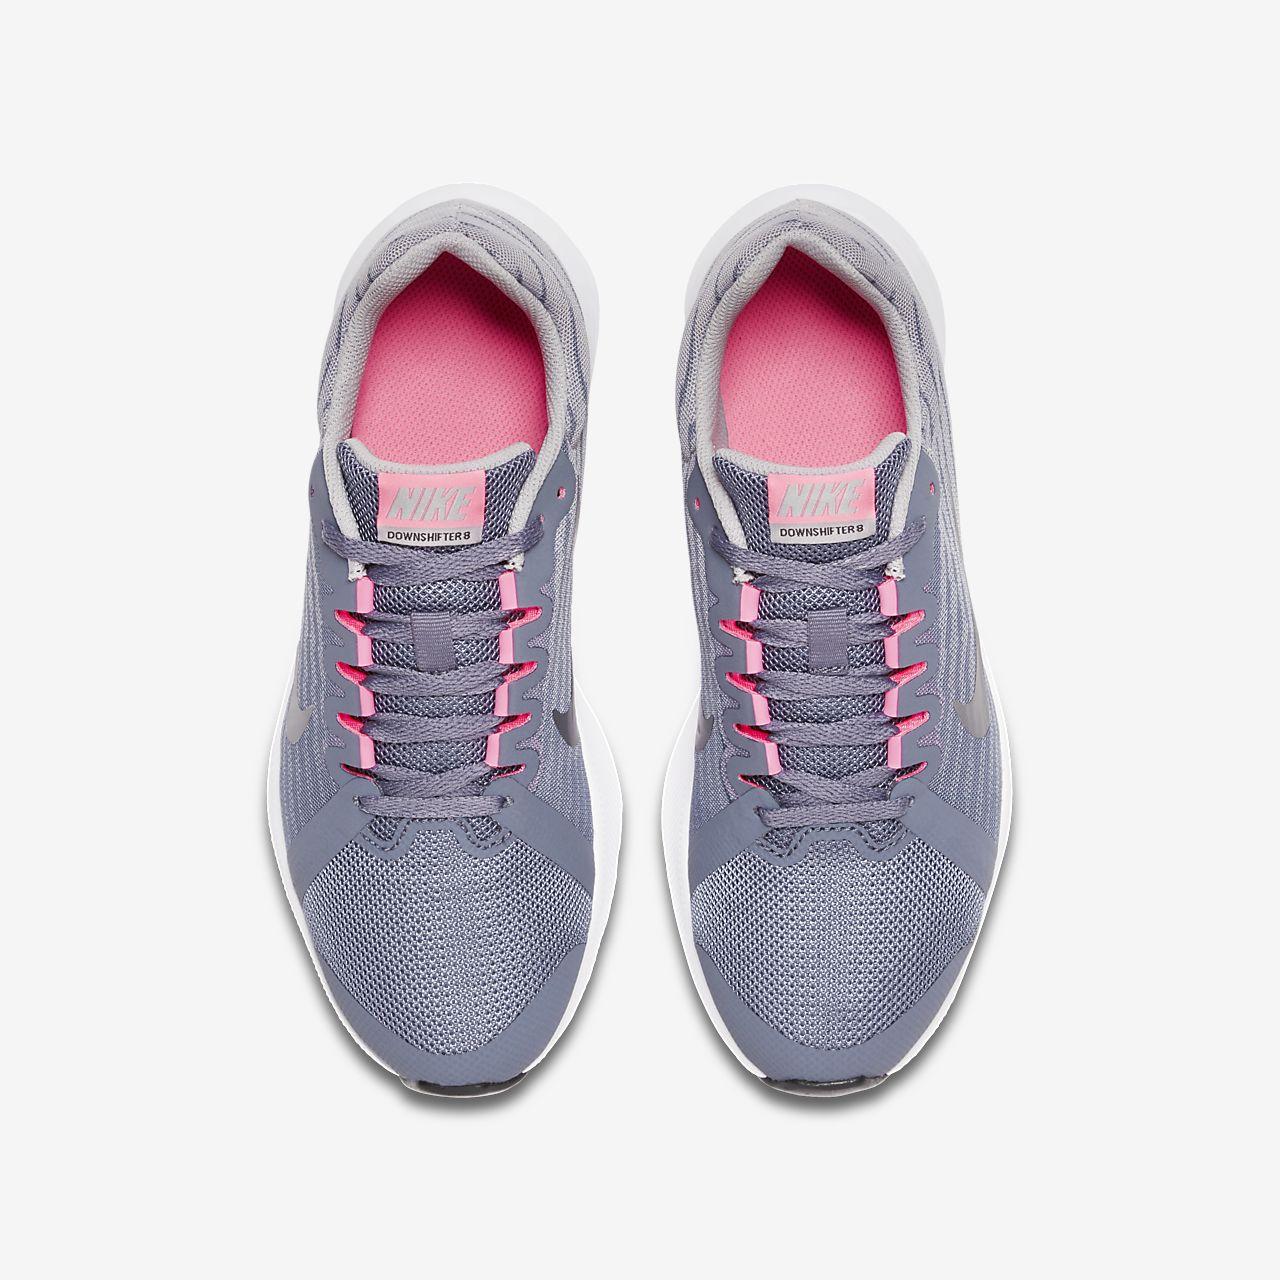 a403fa41a6 Nike Downshifter 8 Older Kids' Running Shoe. Nike.com MA